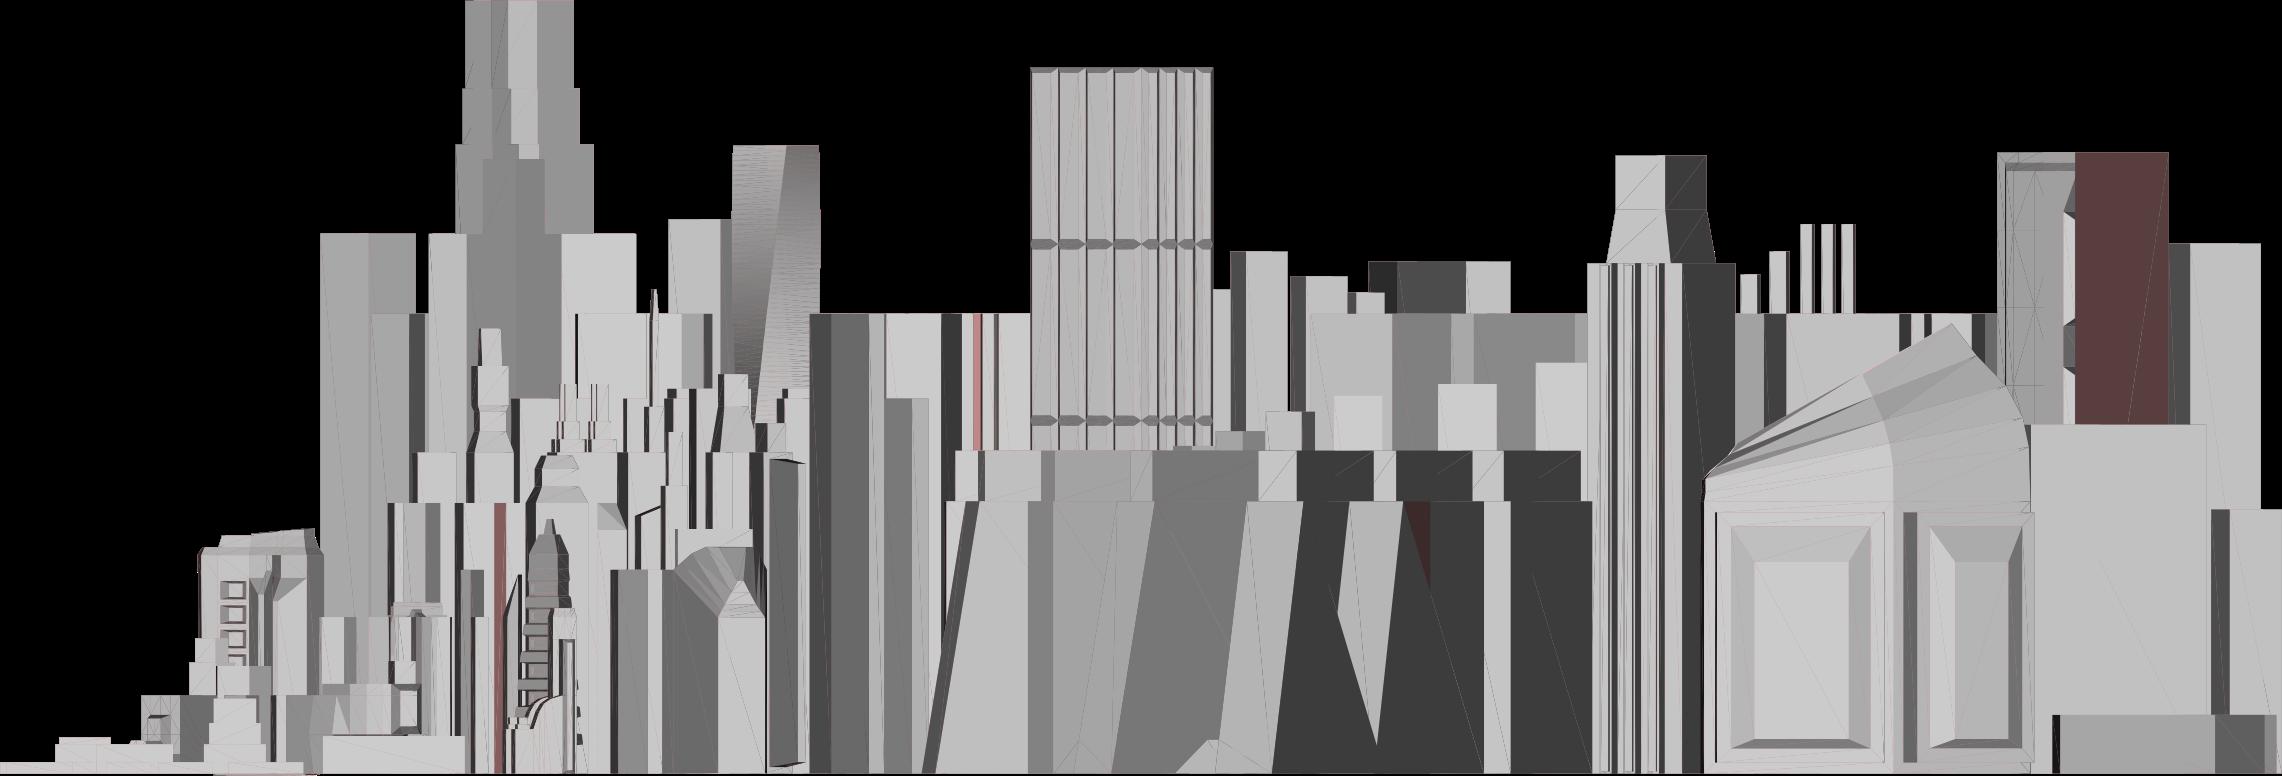 City clipart architecture. Chibi